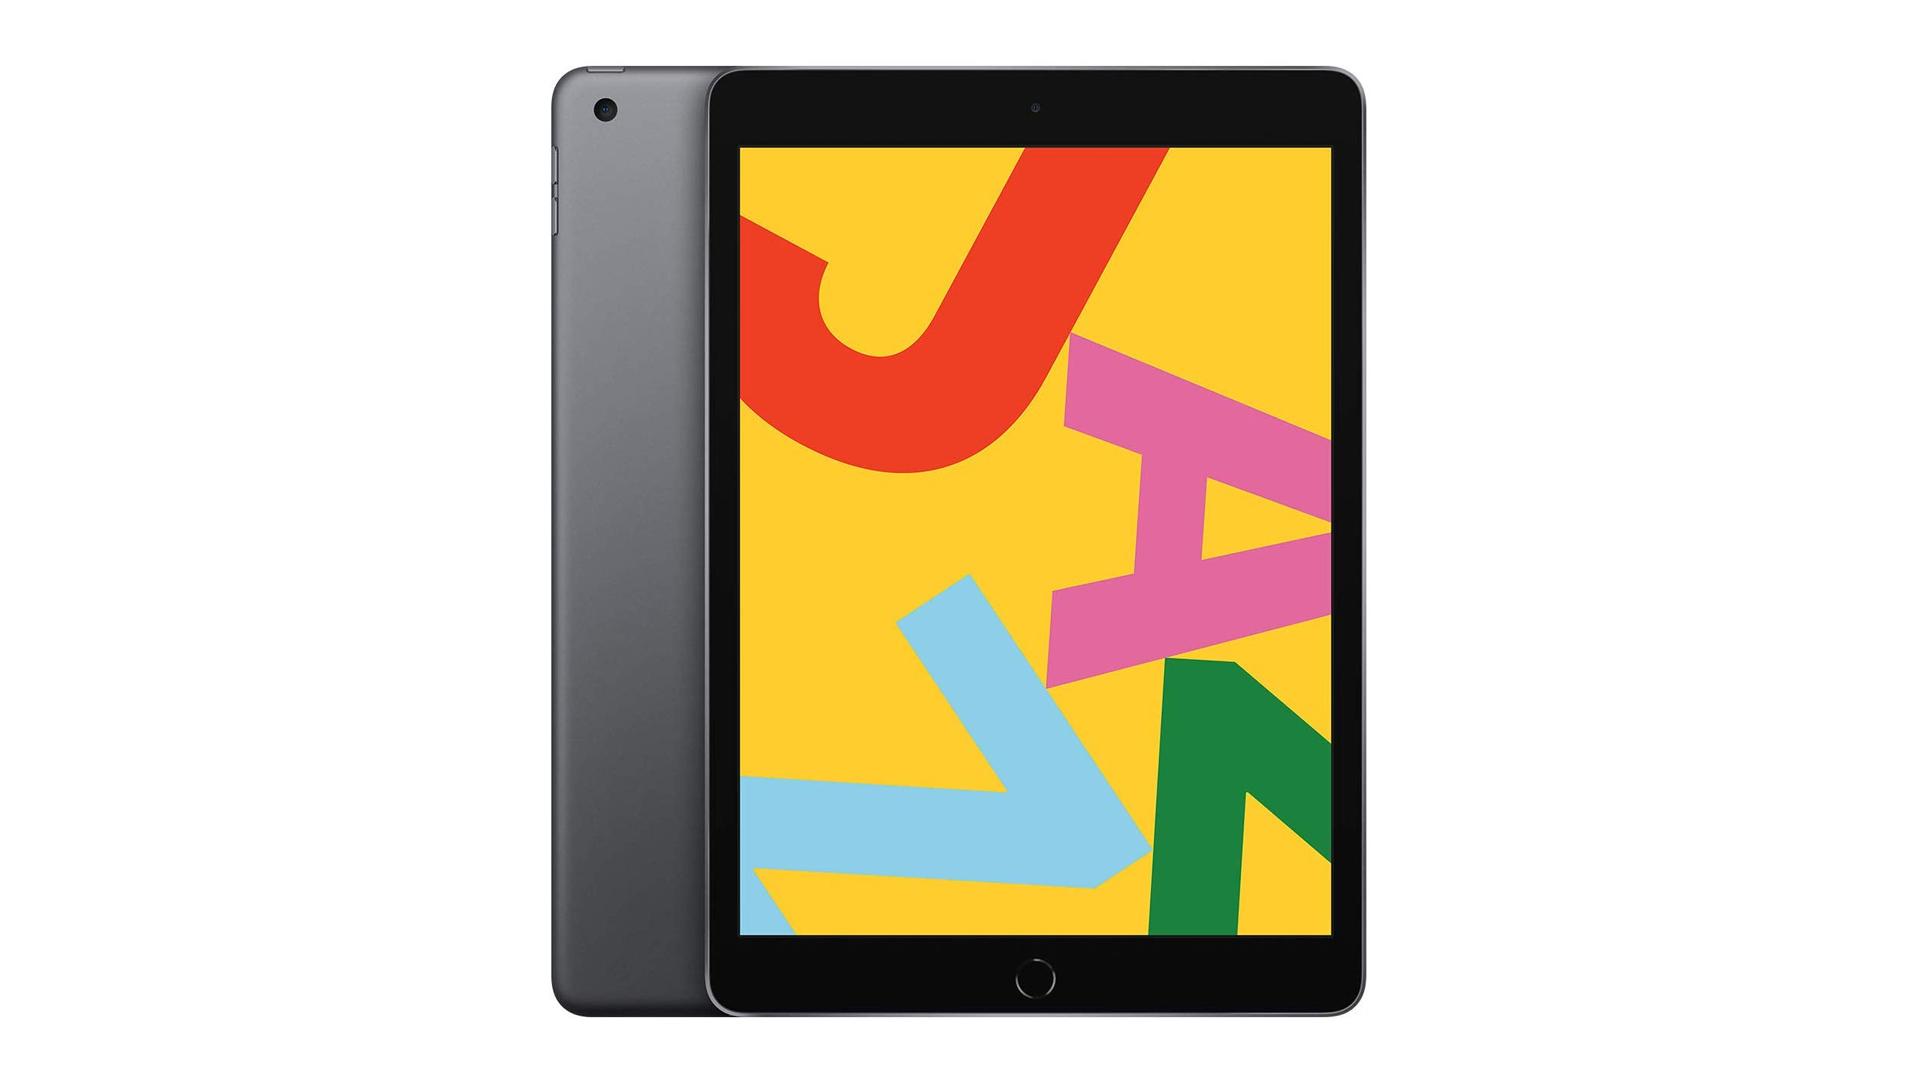 A photo of the iPad.